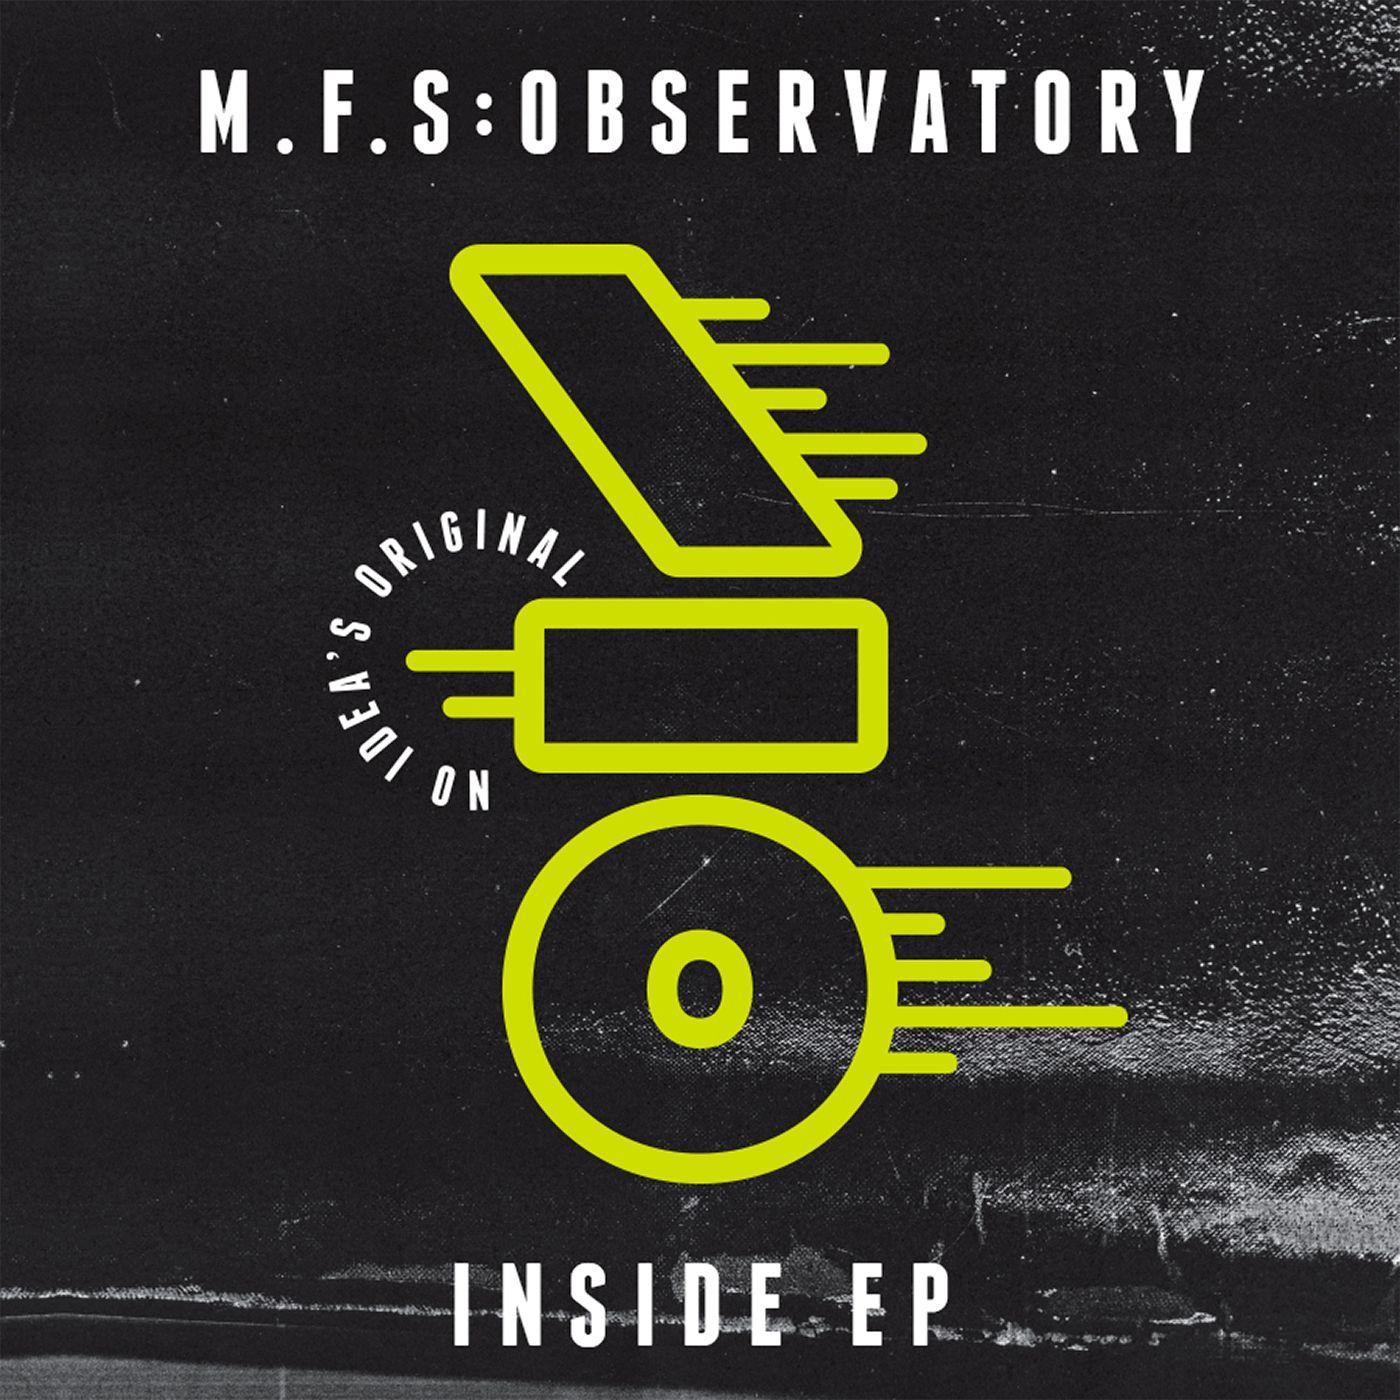 mfs_observatory_-_nio005_-_pack_shot.jpg